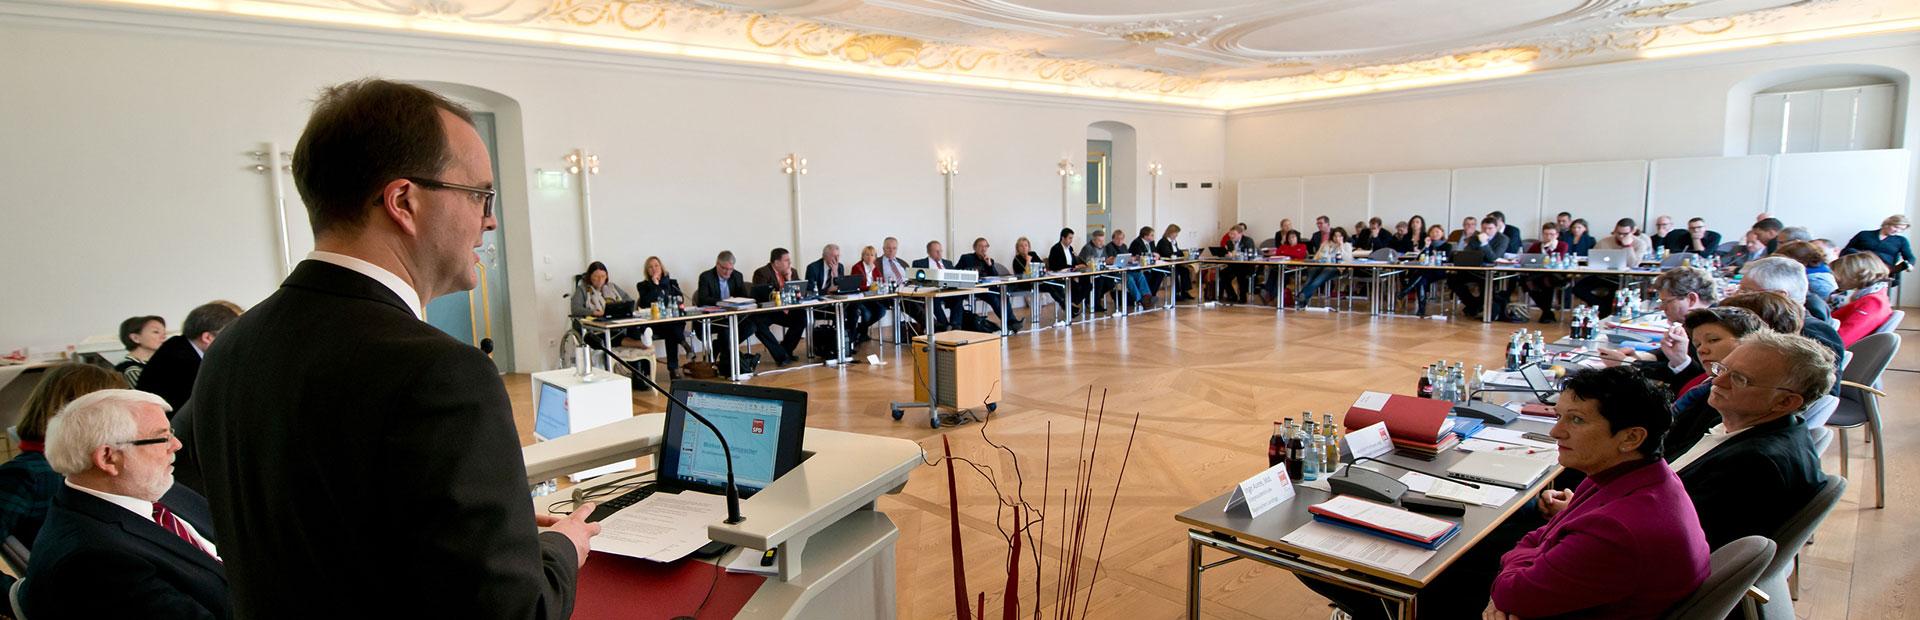 Markus Rinderspacher am Rednerpult vor der BayernSPD-Landtagsfraktion